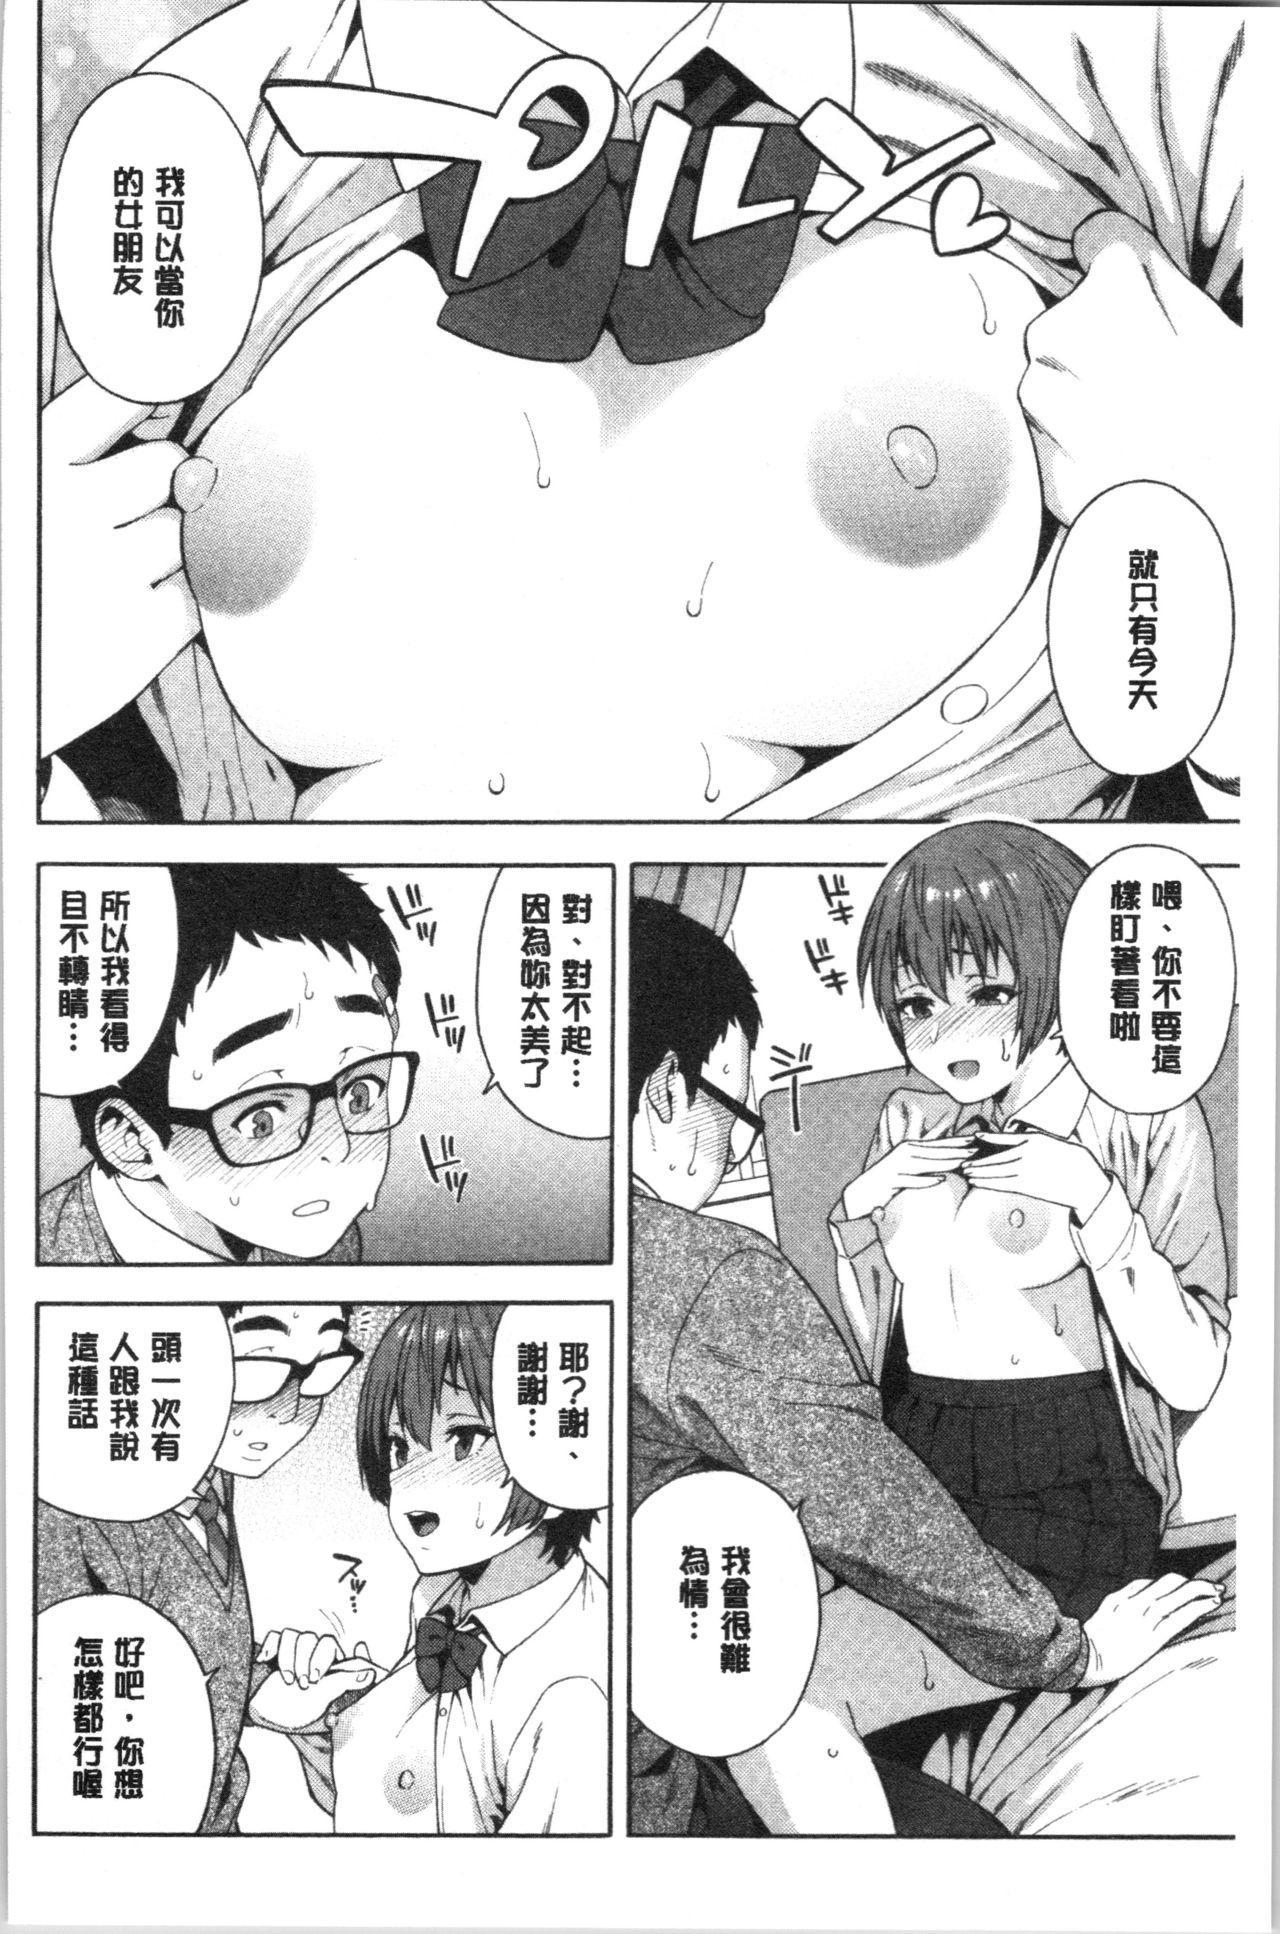 Okashite Ageru | 讓你來侵犯我 166